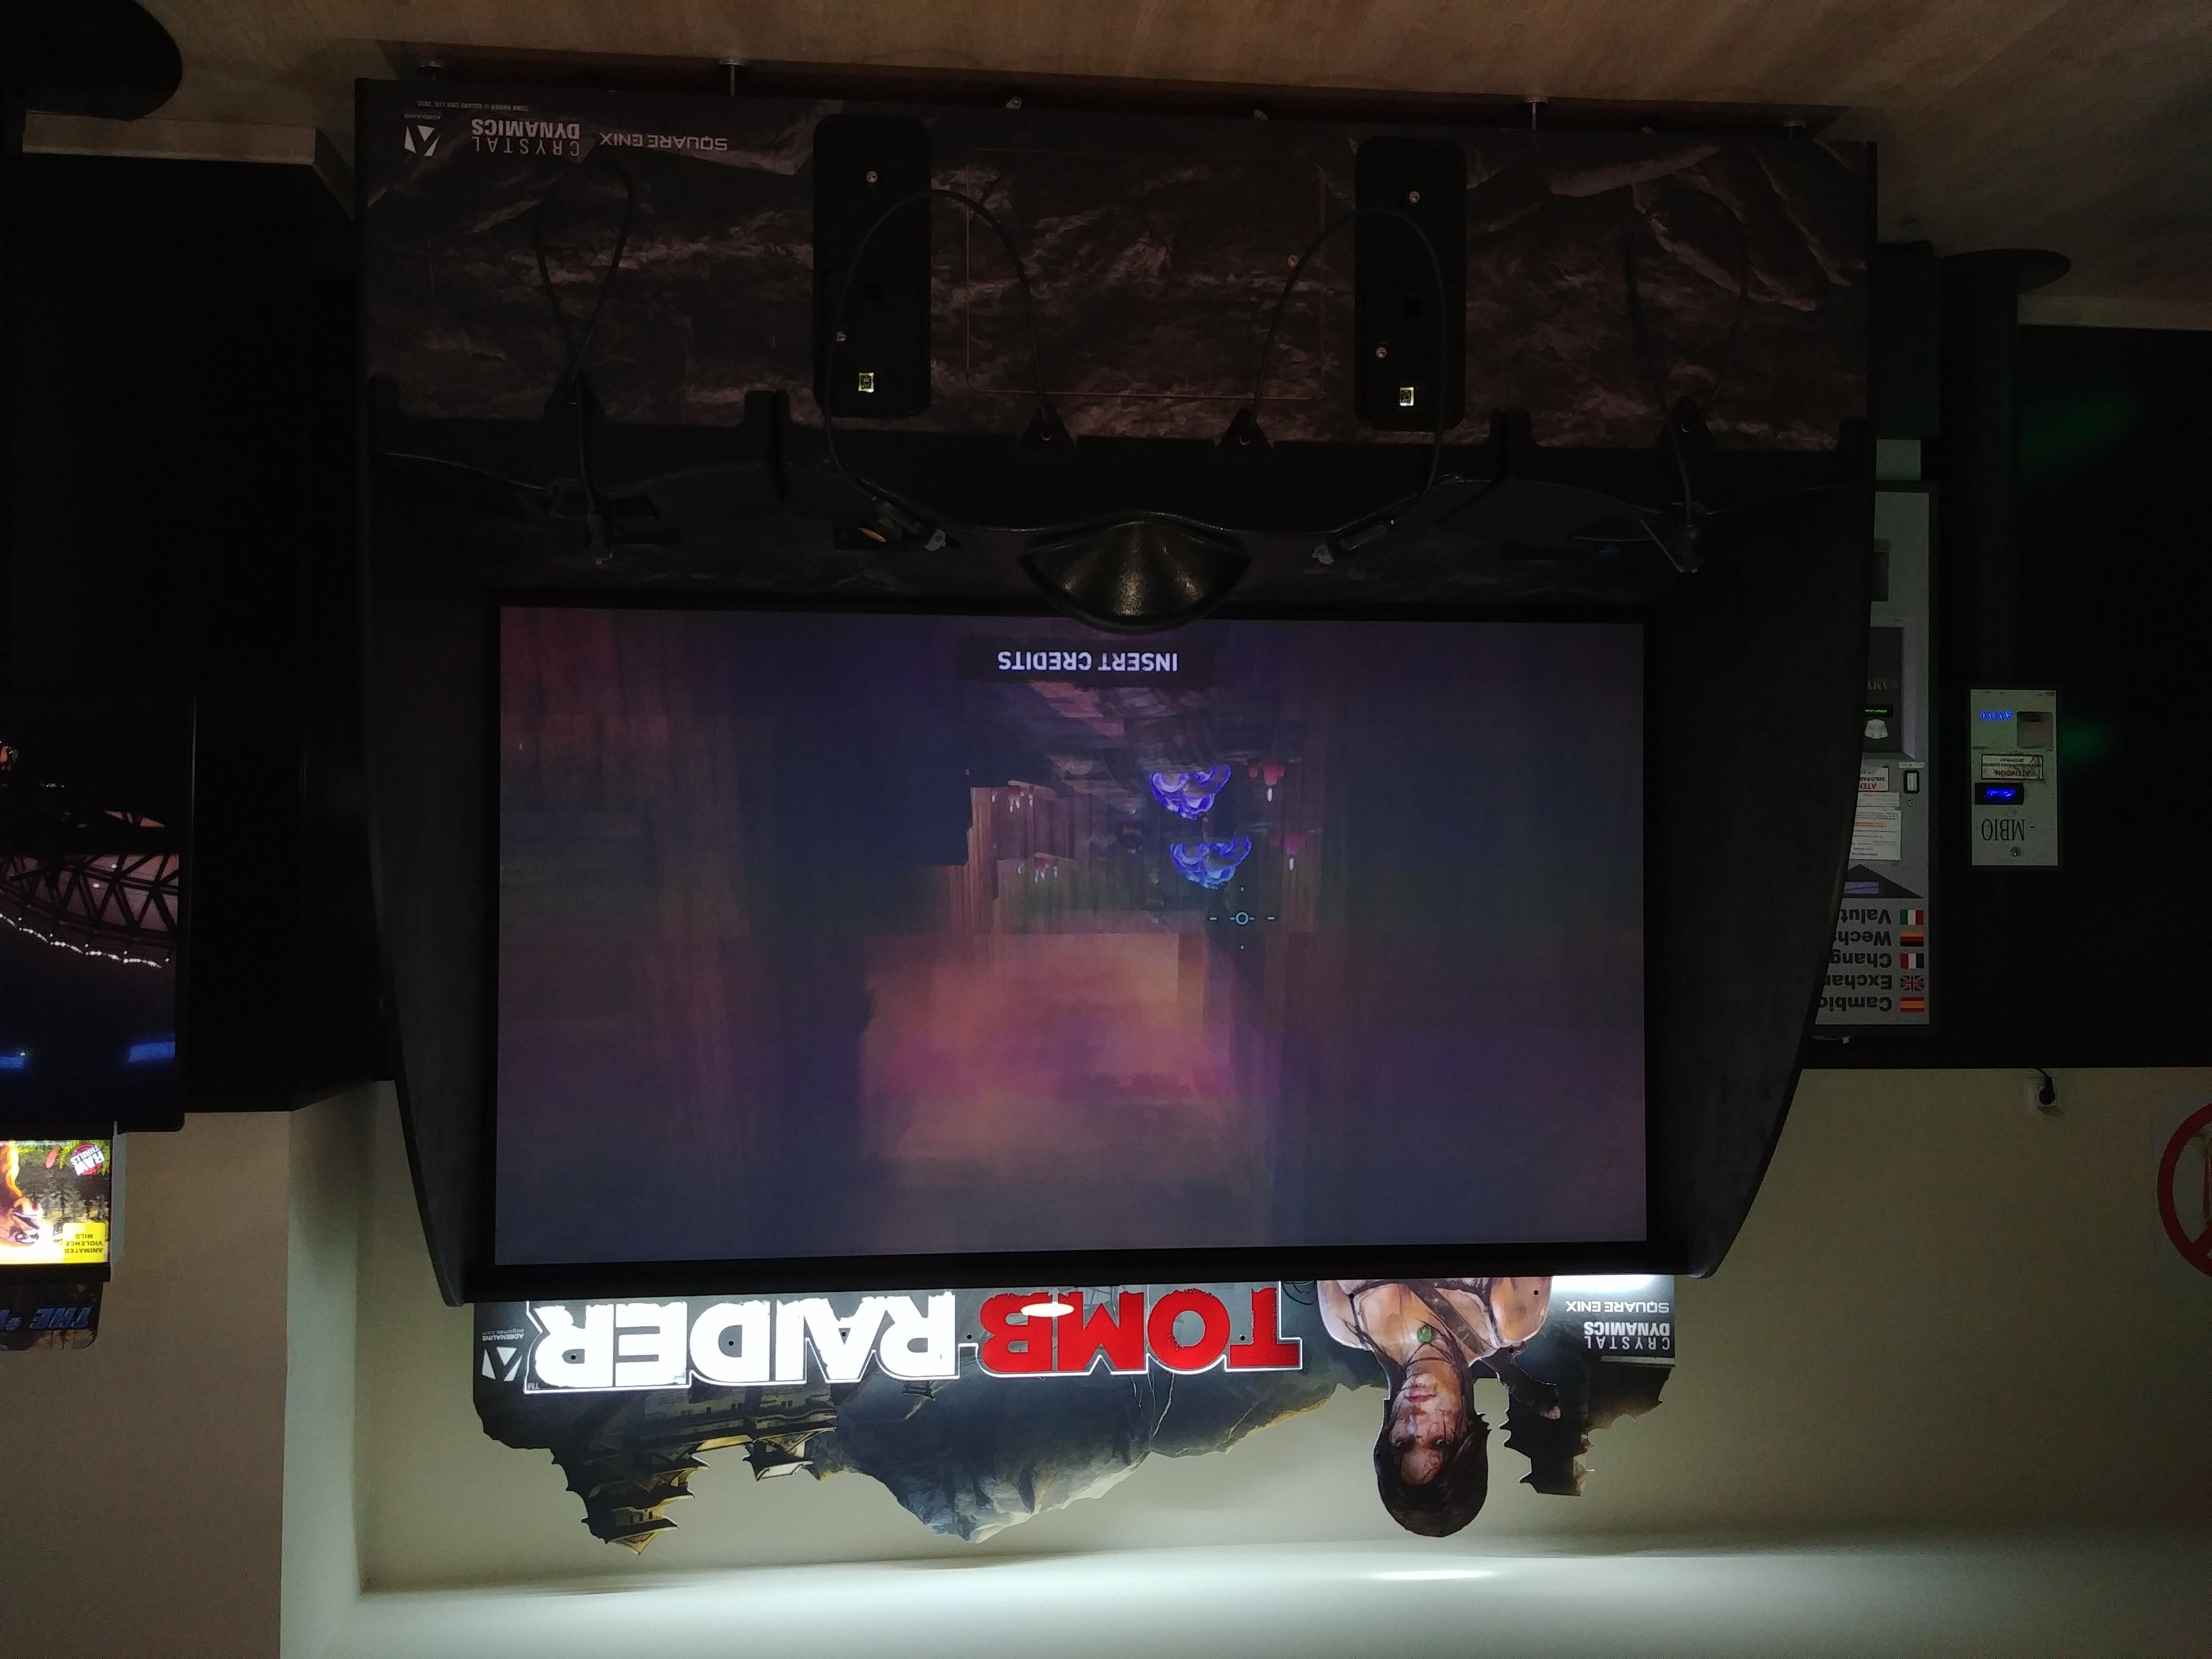 Tomb Raider arcade - Arcade Locations - Picture Gallery - ZIv